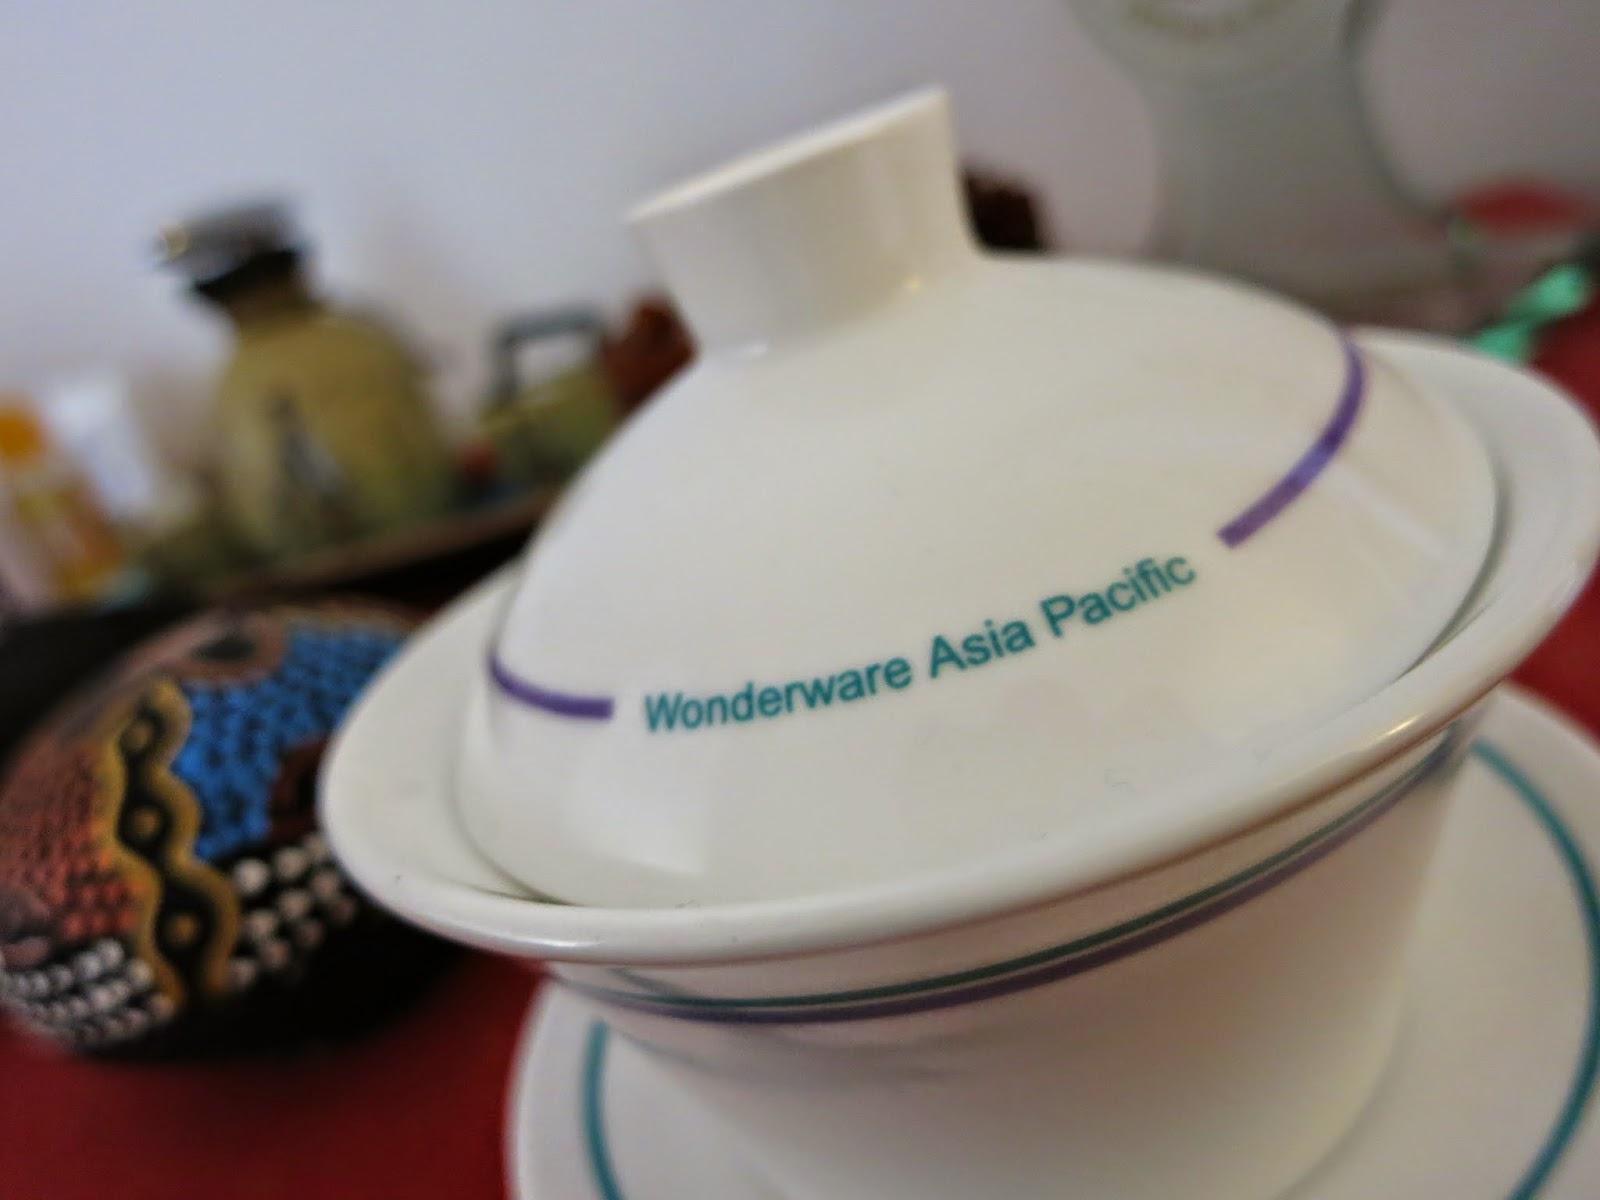 For download plc scada software of wonderware wonderware intouch.